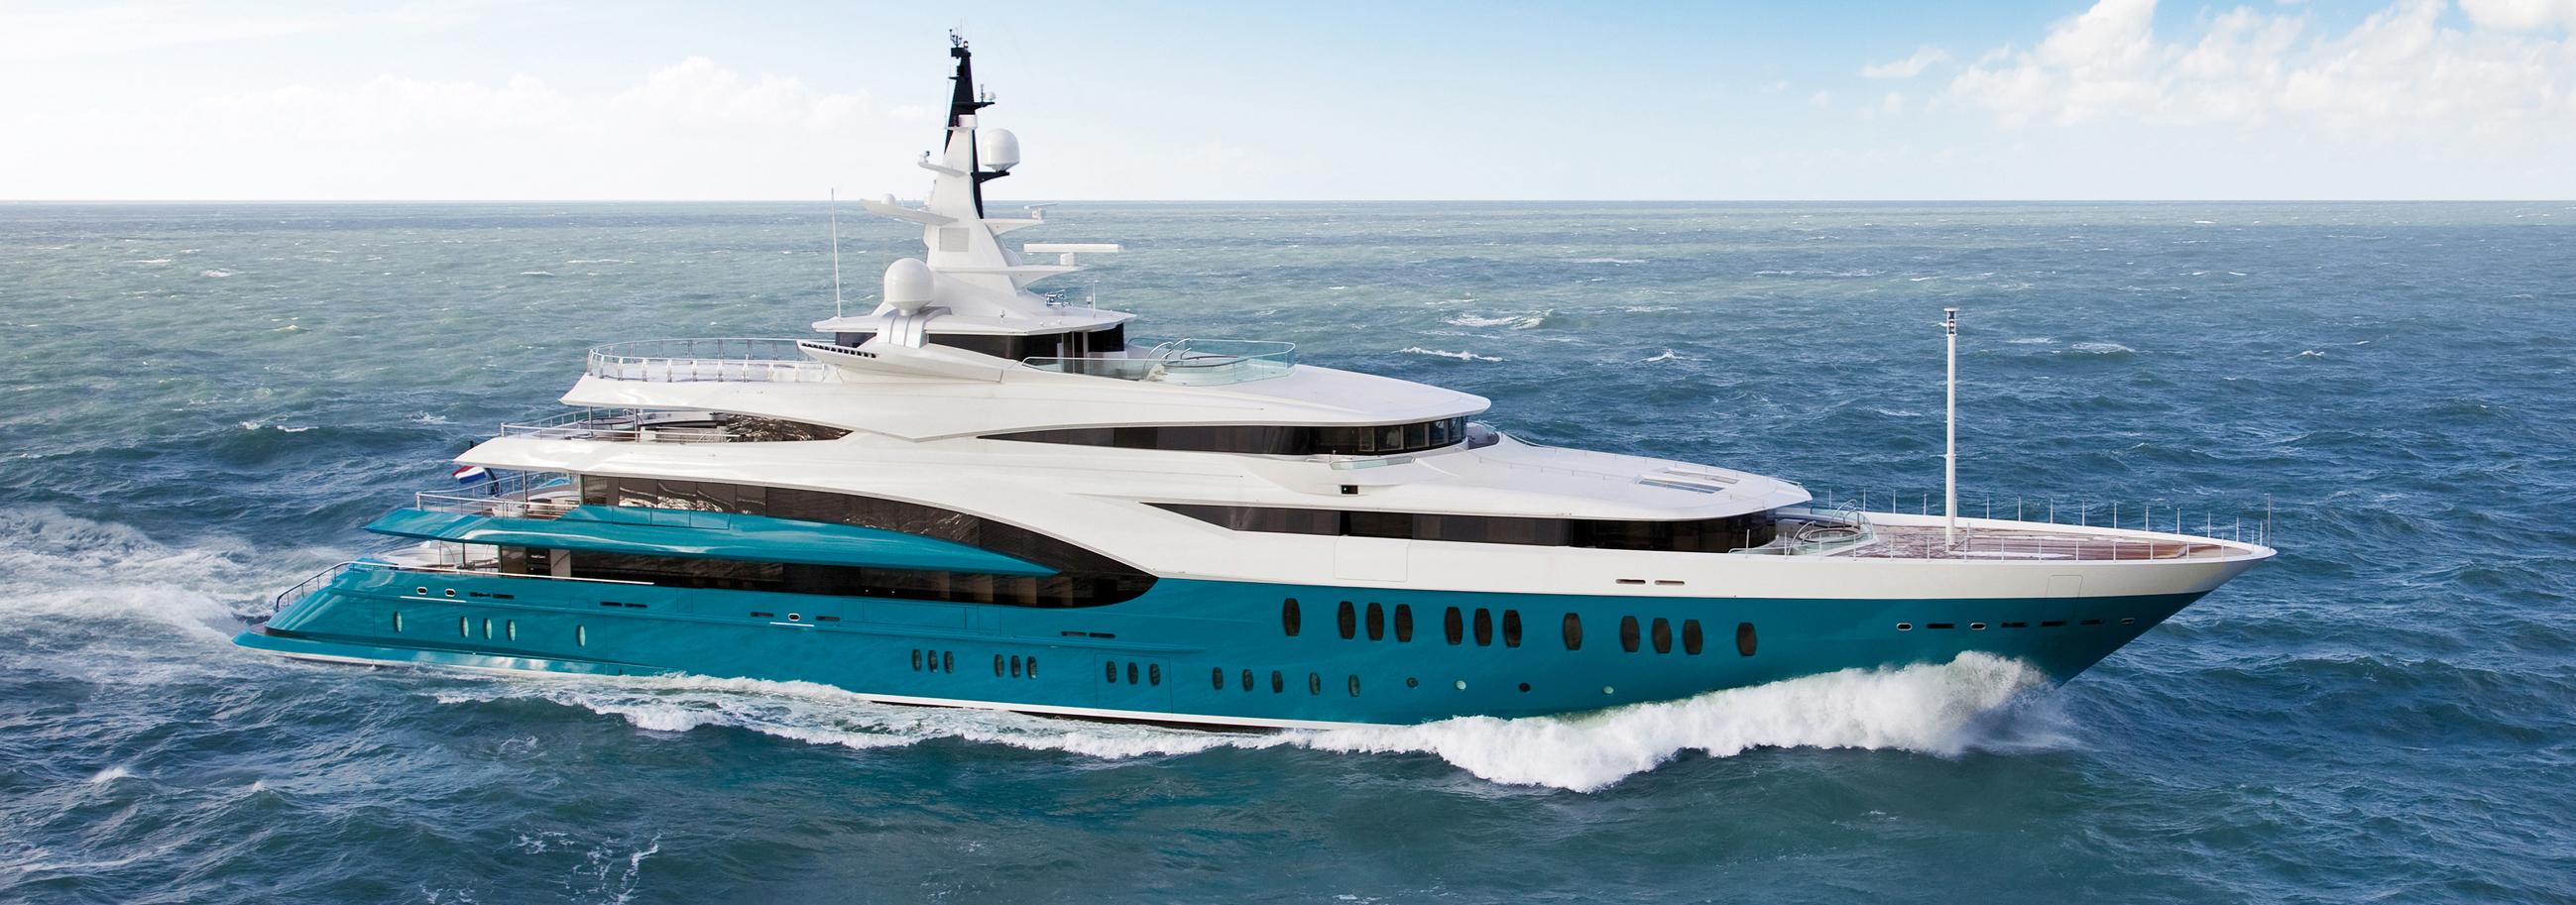 Seychelles Yacht Charter Amp Superyacht News